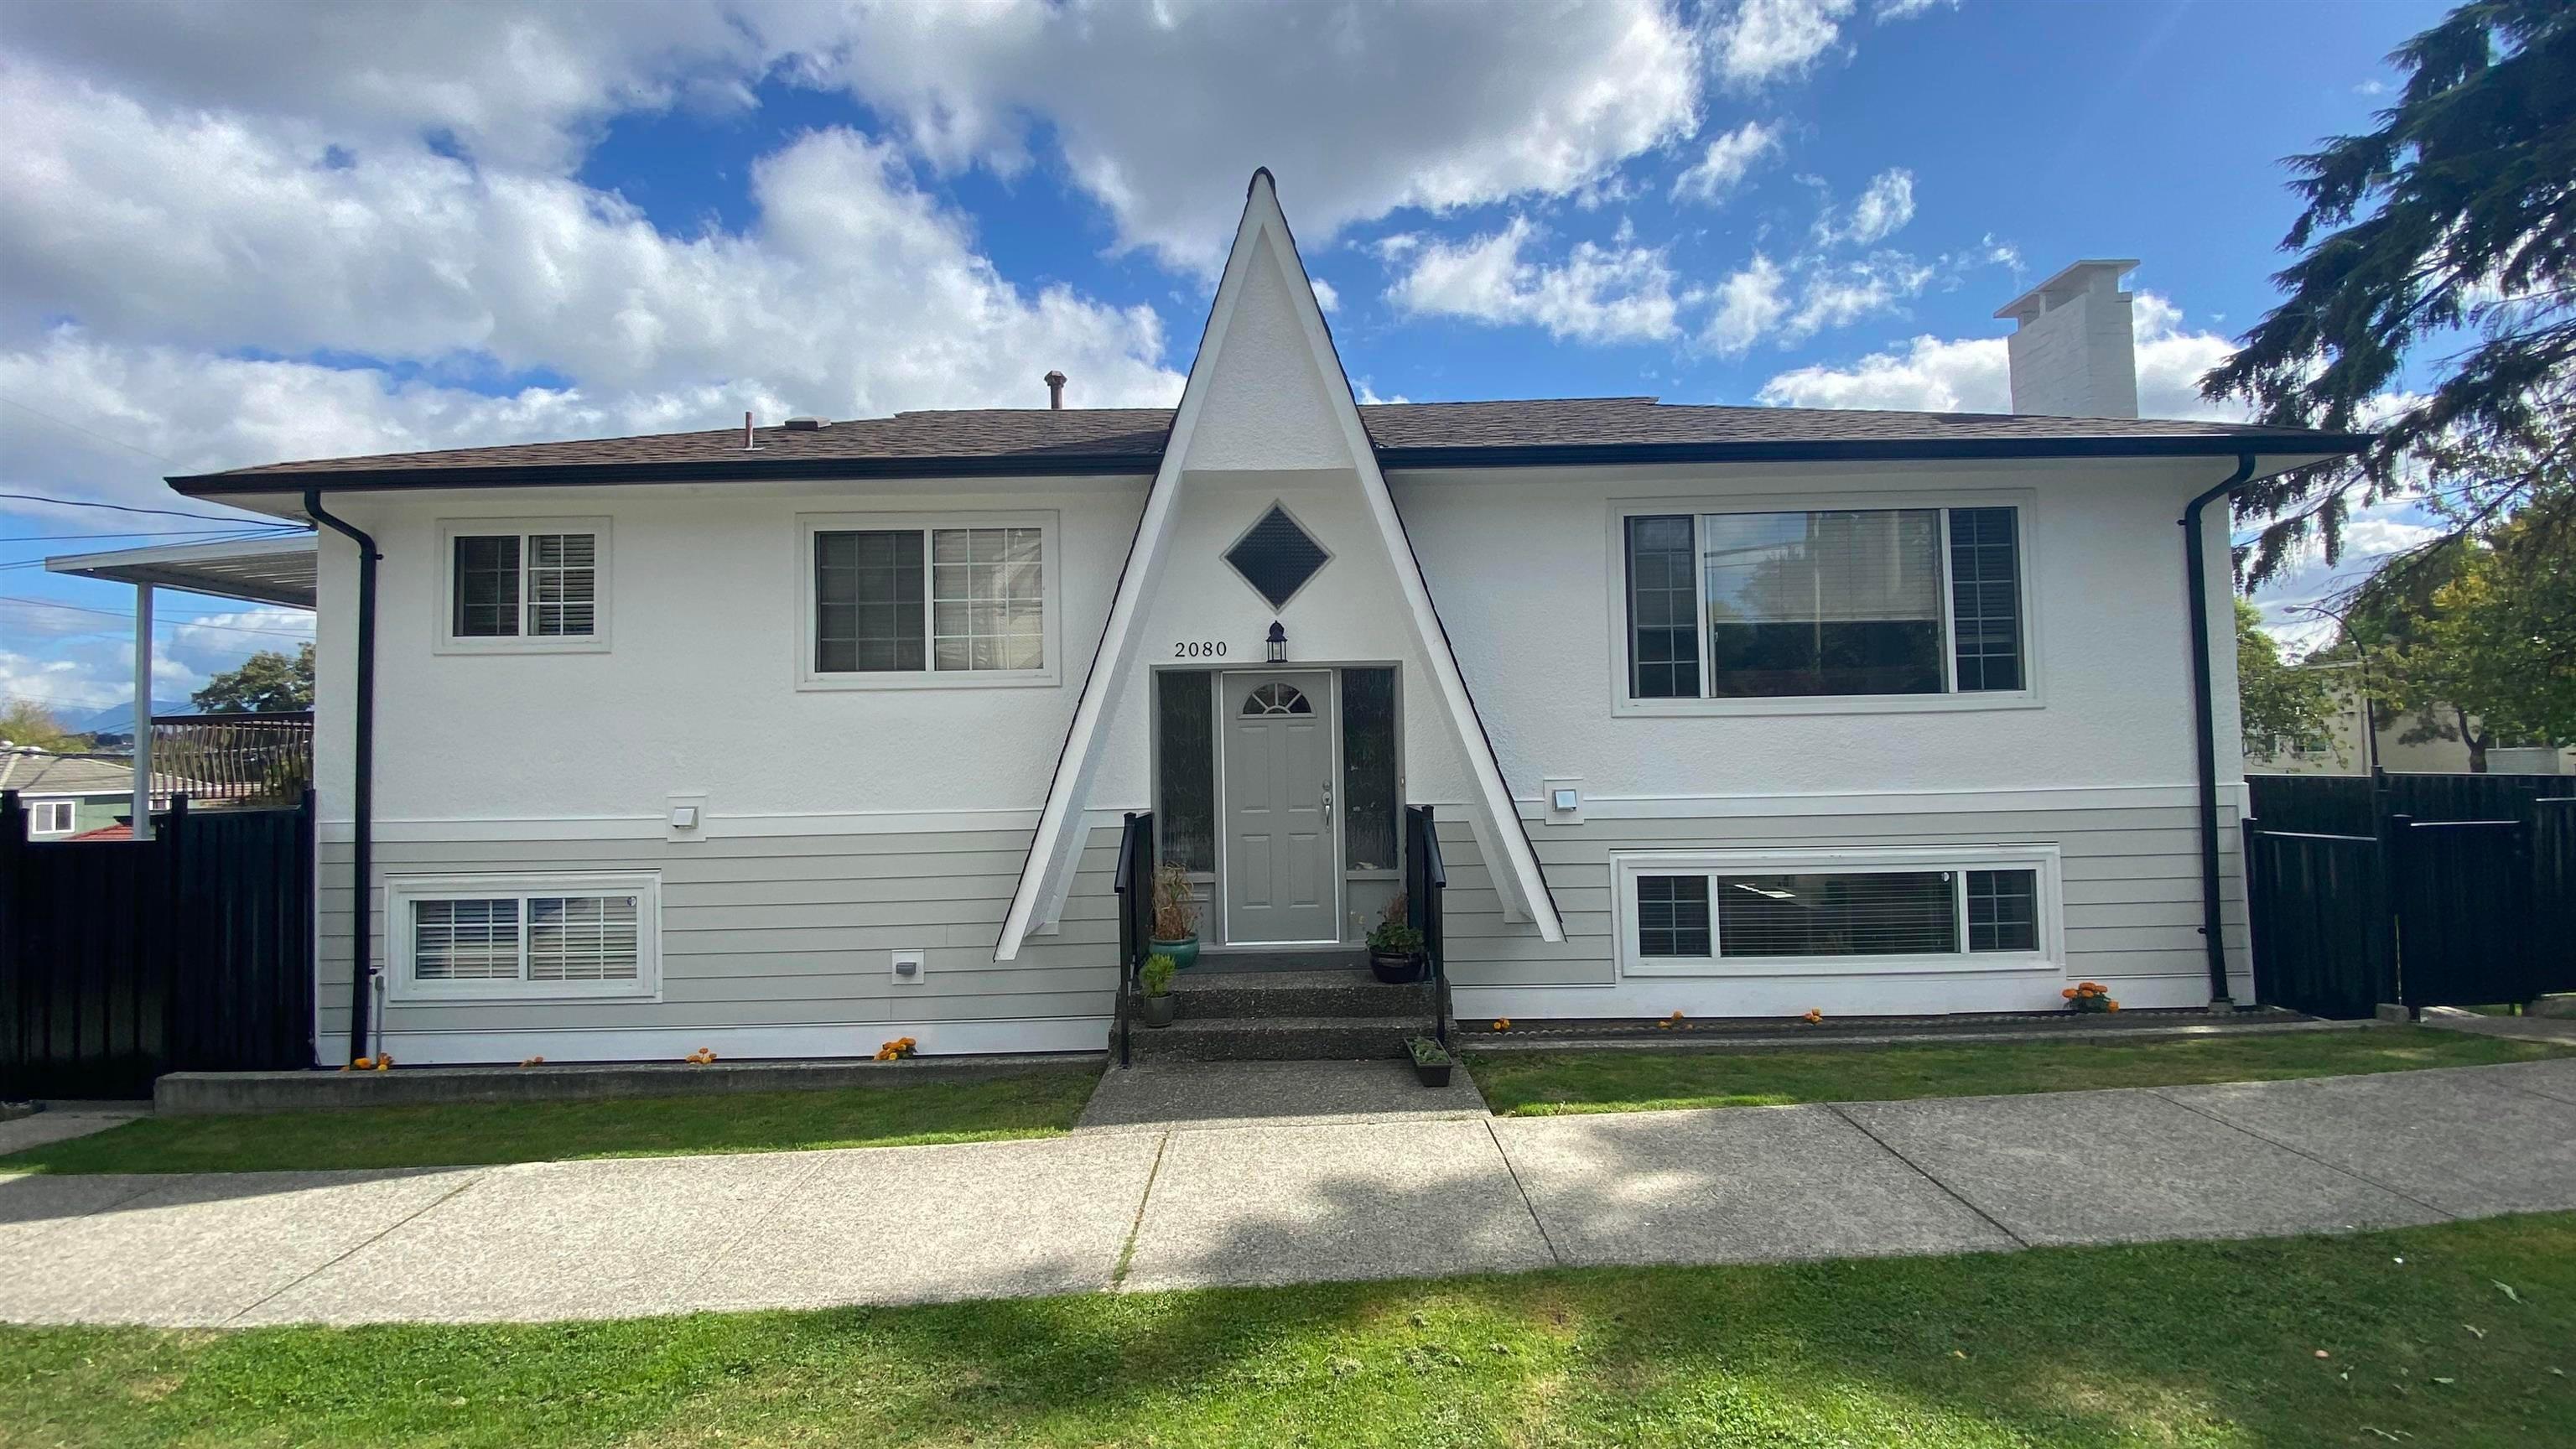 2080 CASSIAR STREET - Renfrew VE House/Single Family for sale, 4 Bedrooms (R2620405) - #1